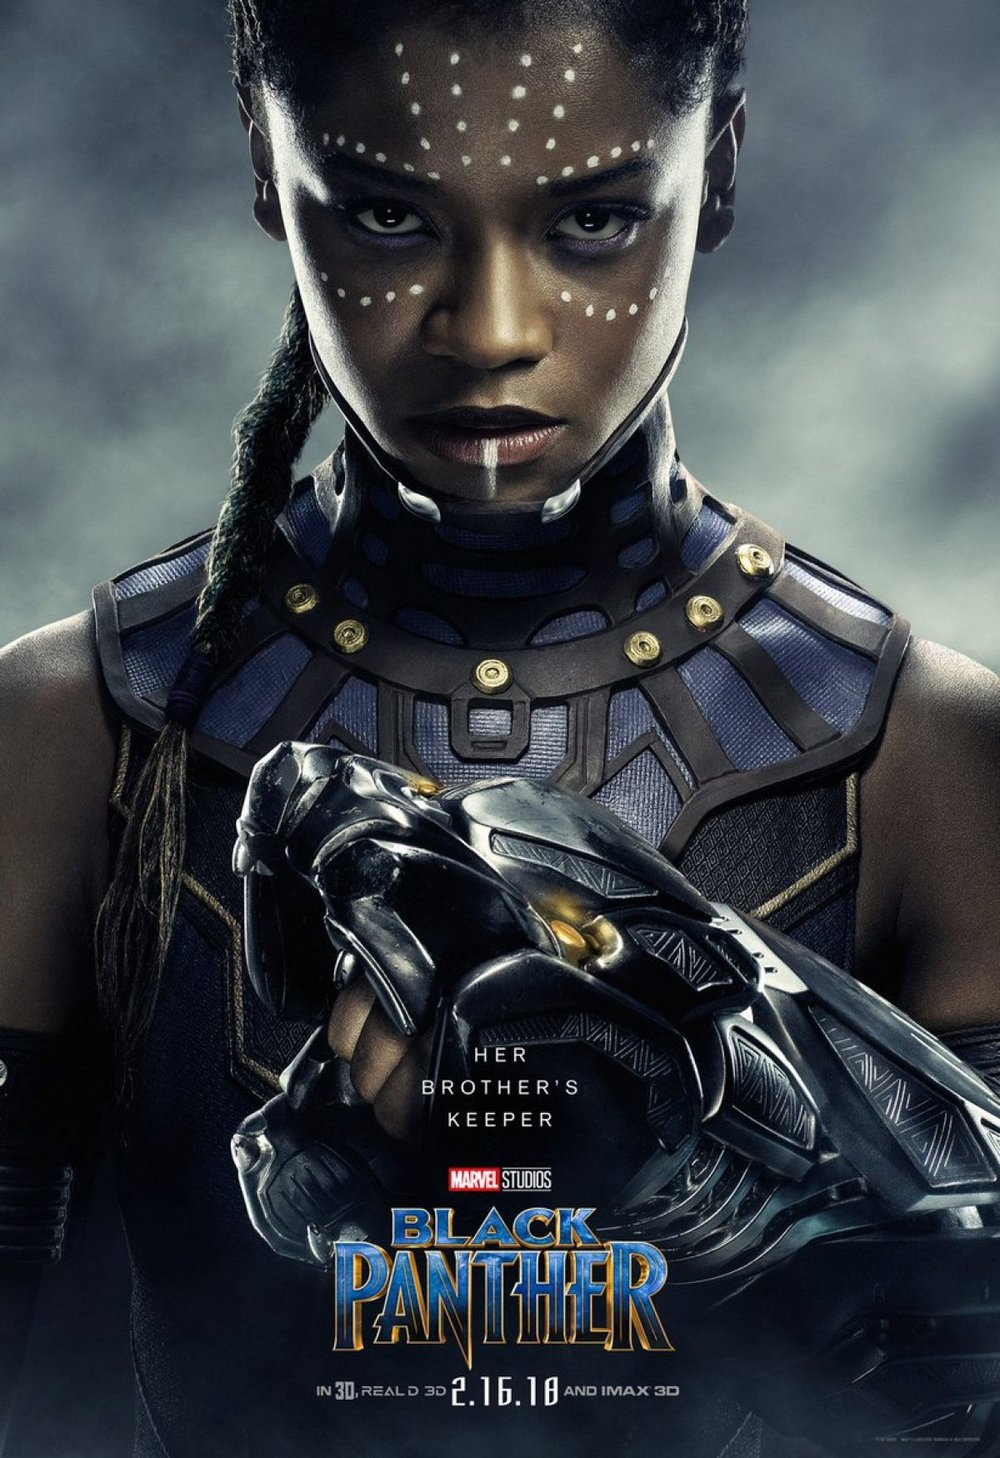 Black-Panther-Poster-5_1200_1750_81_s.jpeg